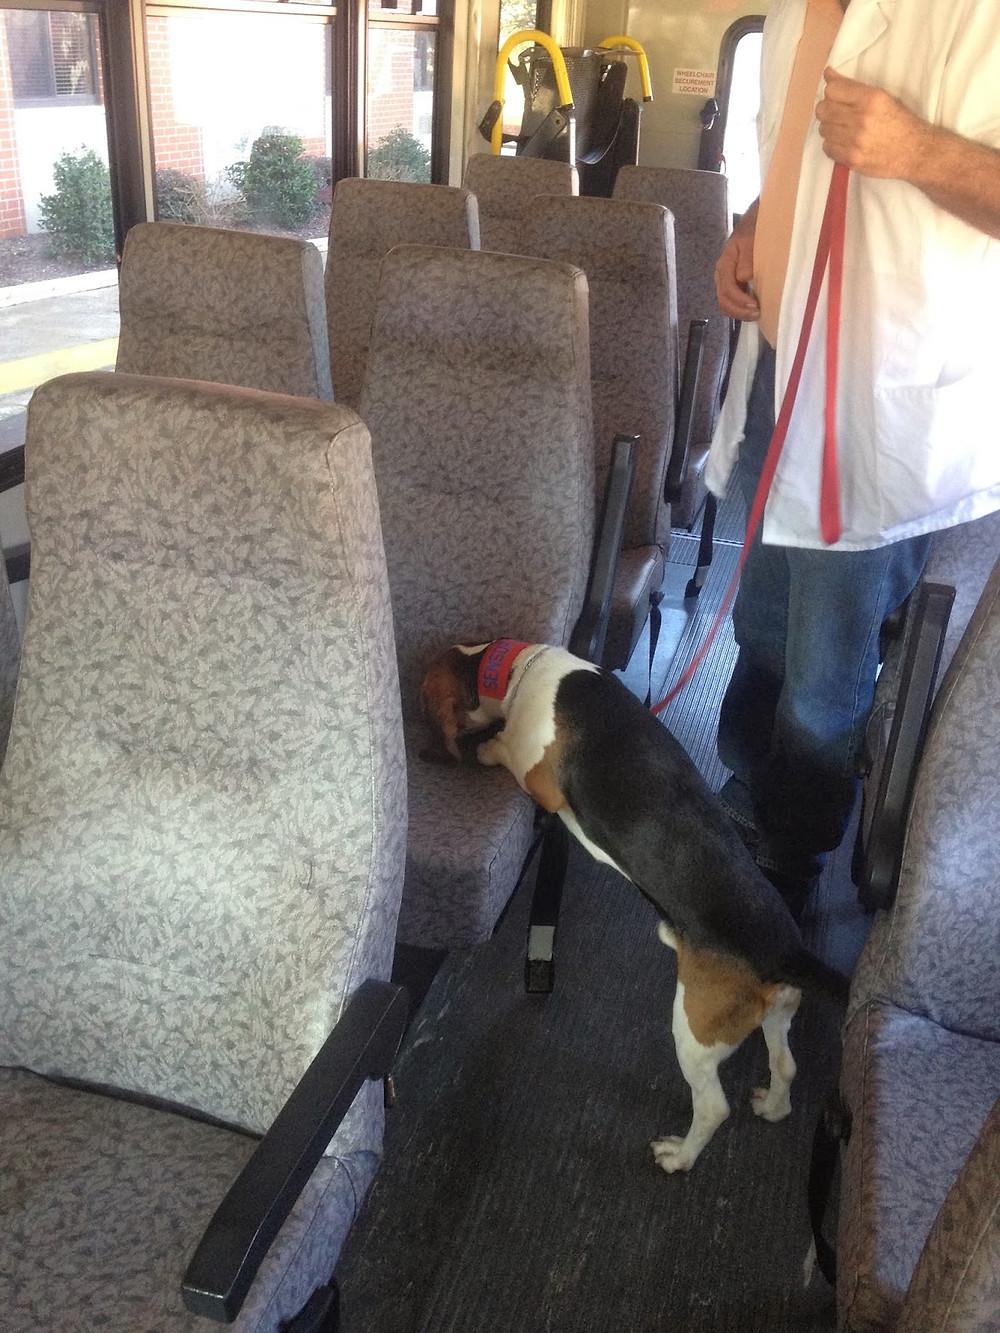 sensor bed bug dog checking bus bed bugs macon atlanta georgia